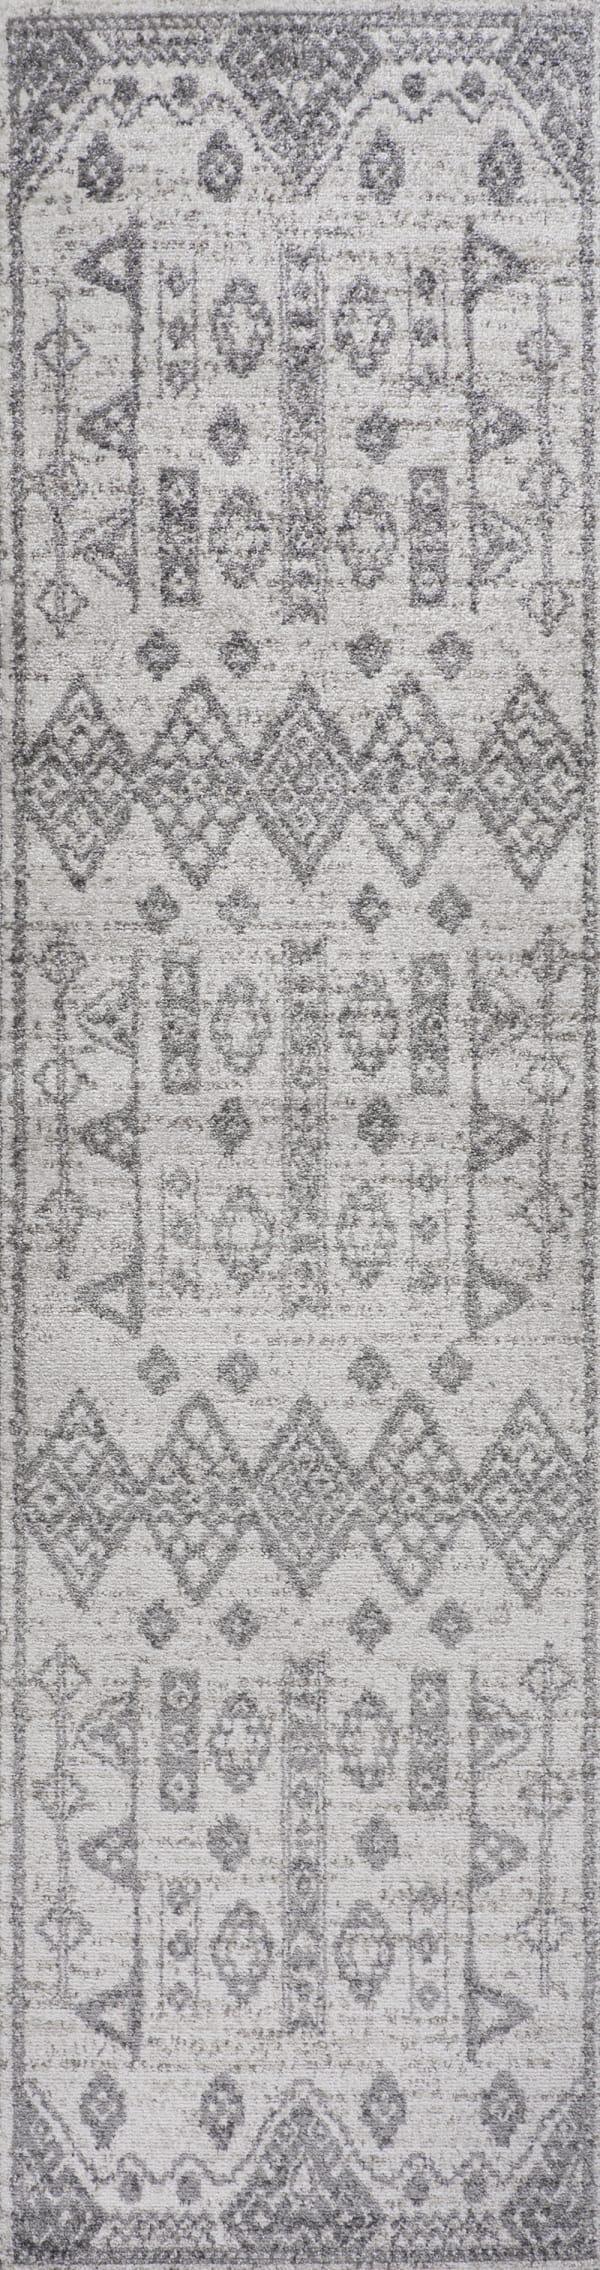 Tribal Diamond Geometric Gray/Beige 2' x 8' Runner Rug